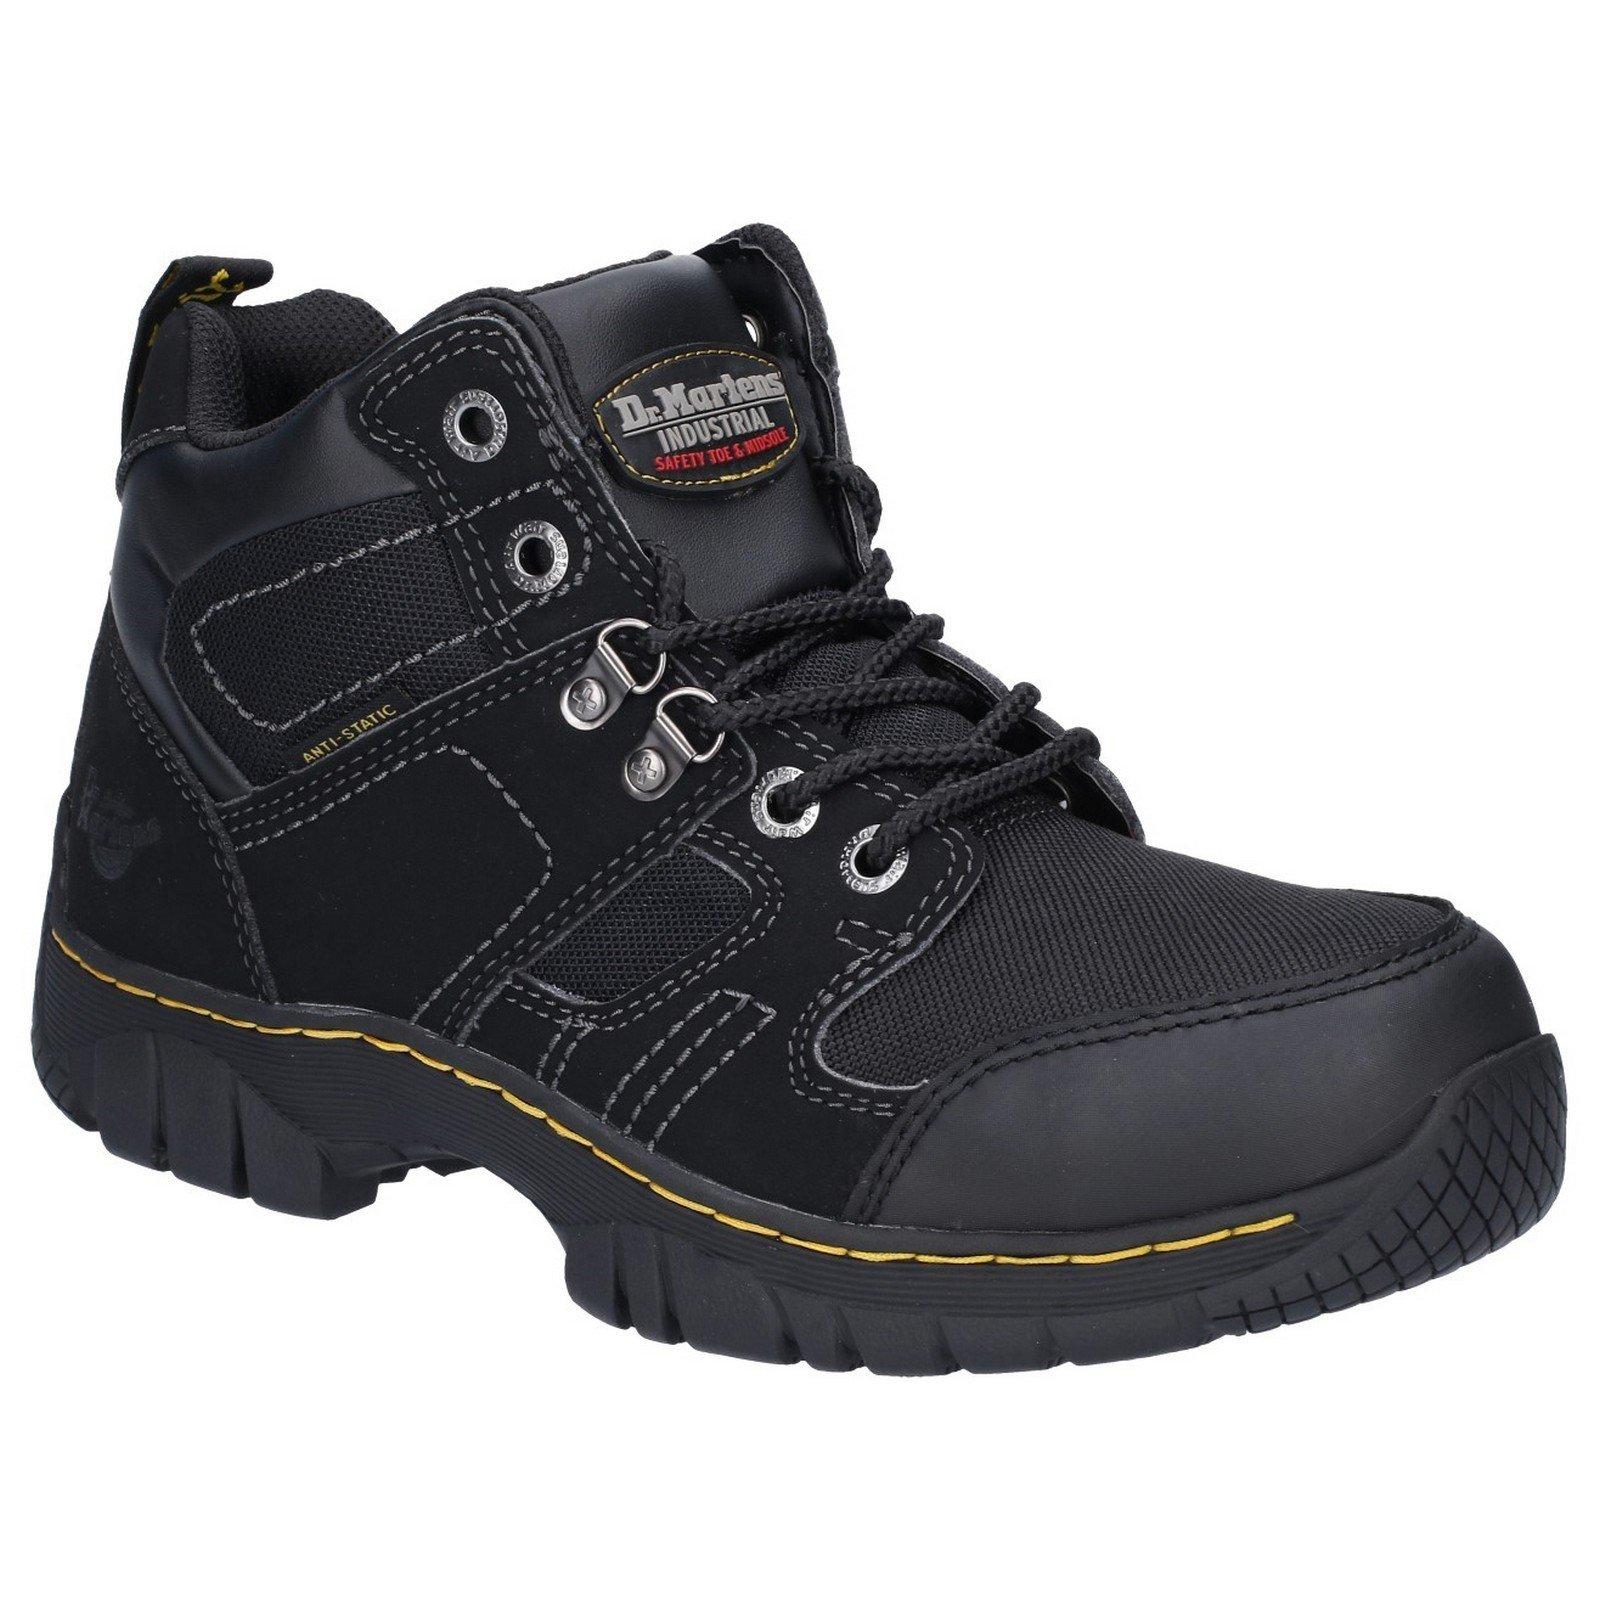 Dr Martens Unisex Benham Safety Boots Black 21647-34773 - Black 7